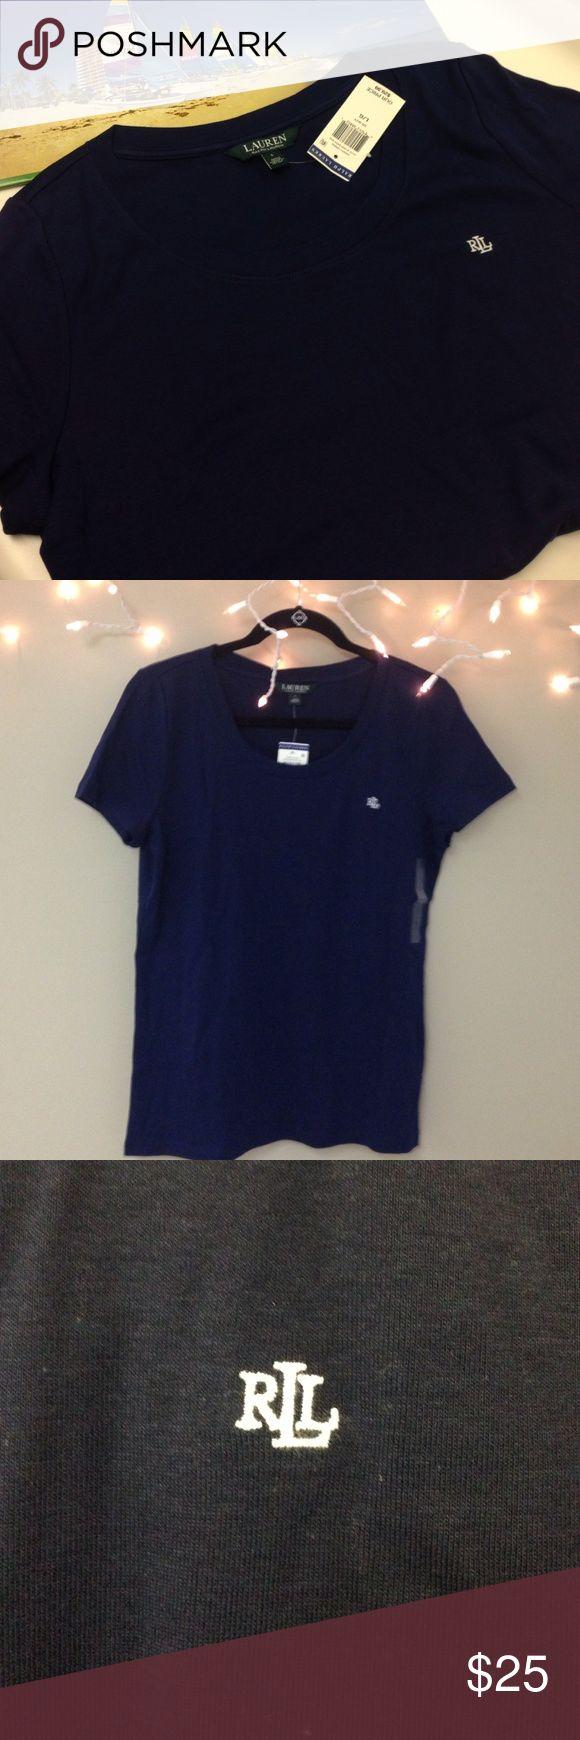 Black keys t shirt uk - Black Keys T Shirt Uk 20